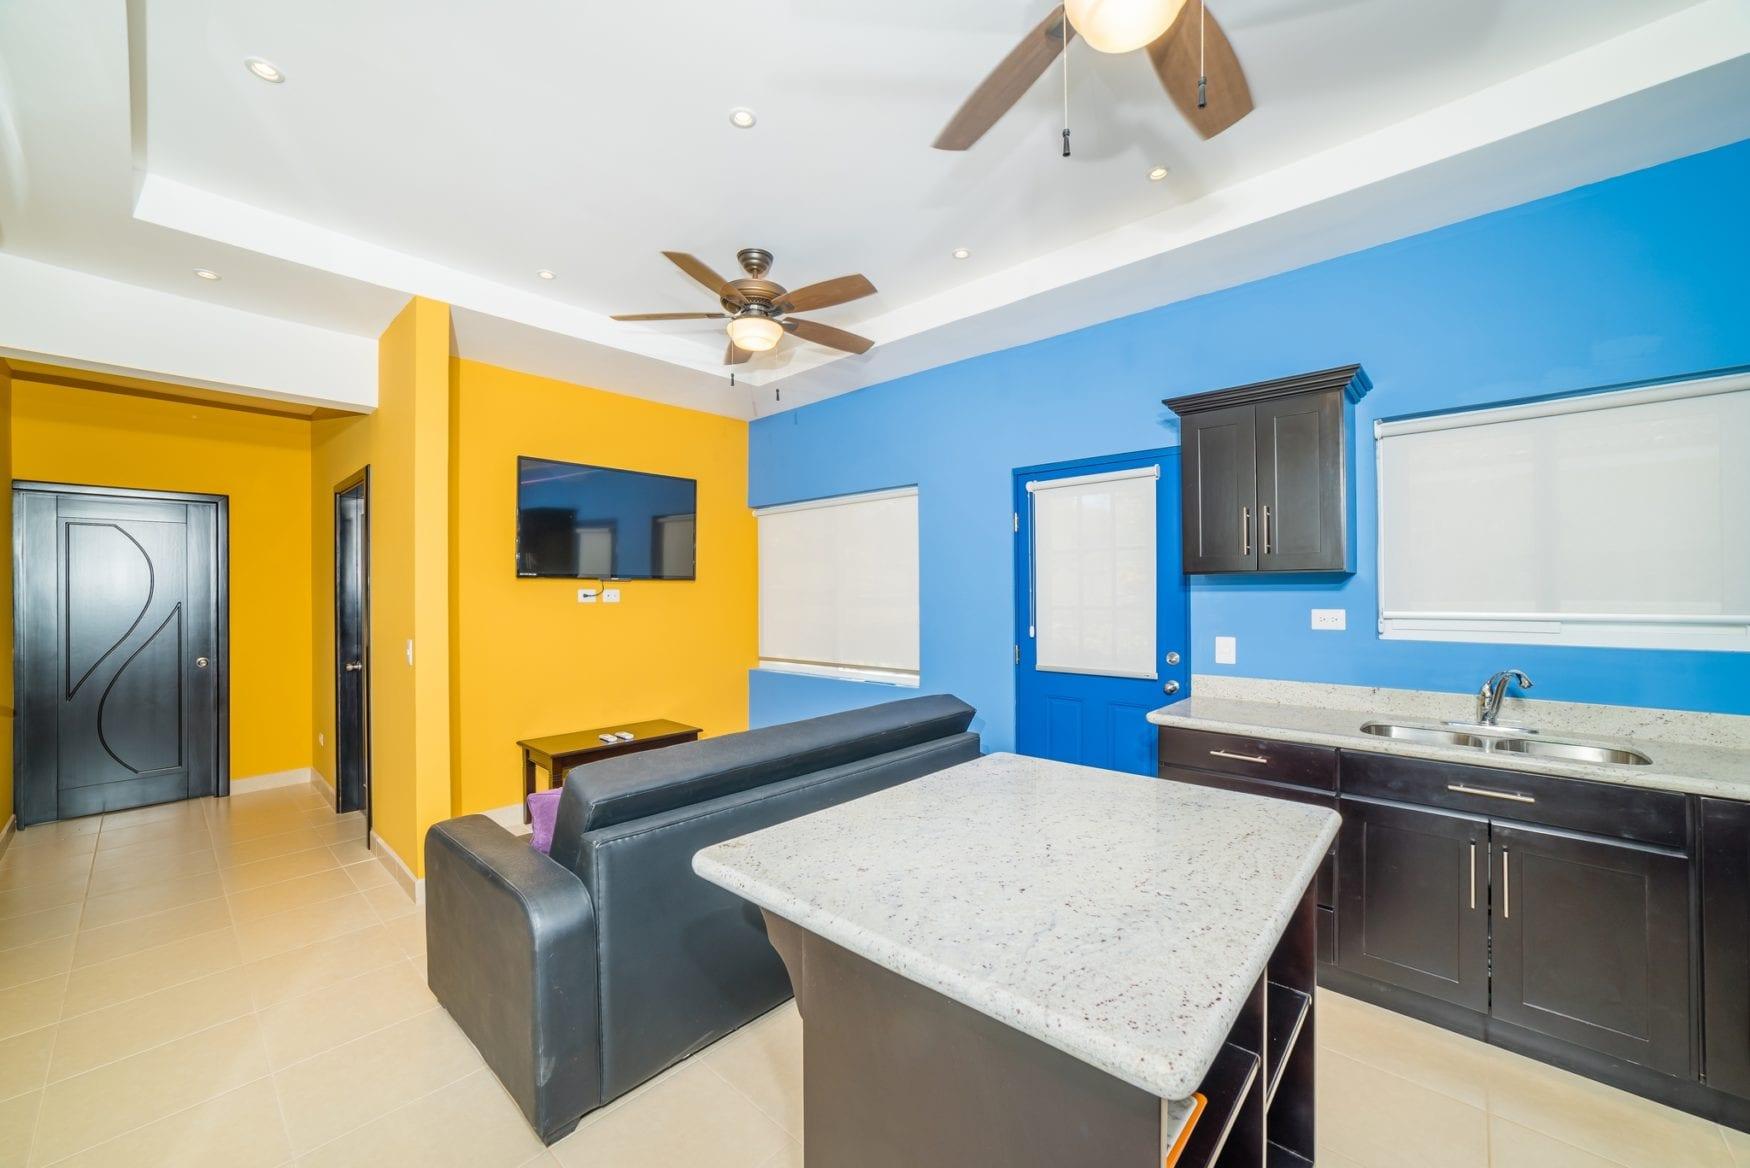 Guest house kitchen island